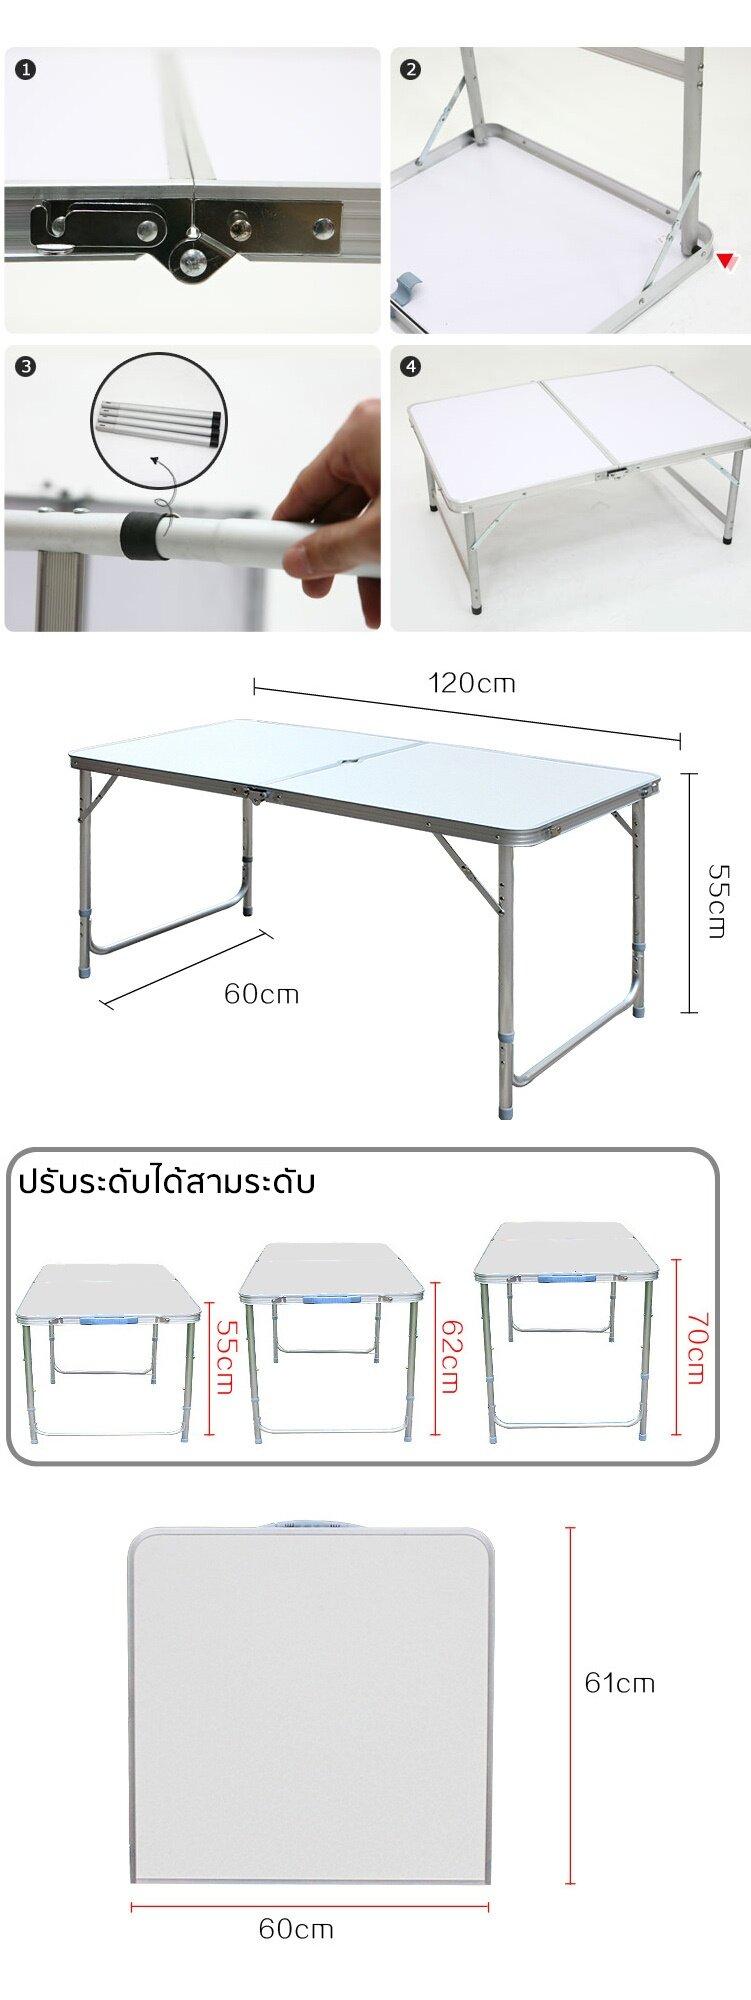 Max De folding picnic table instruction